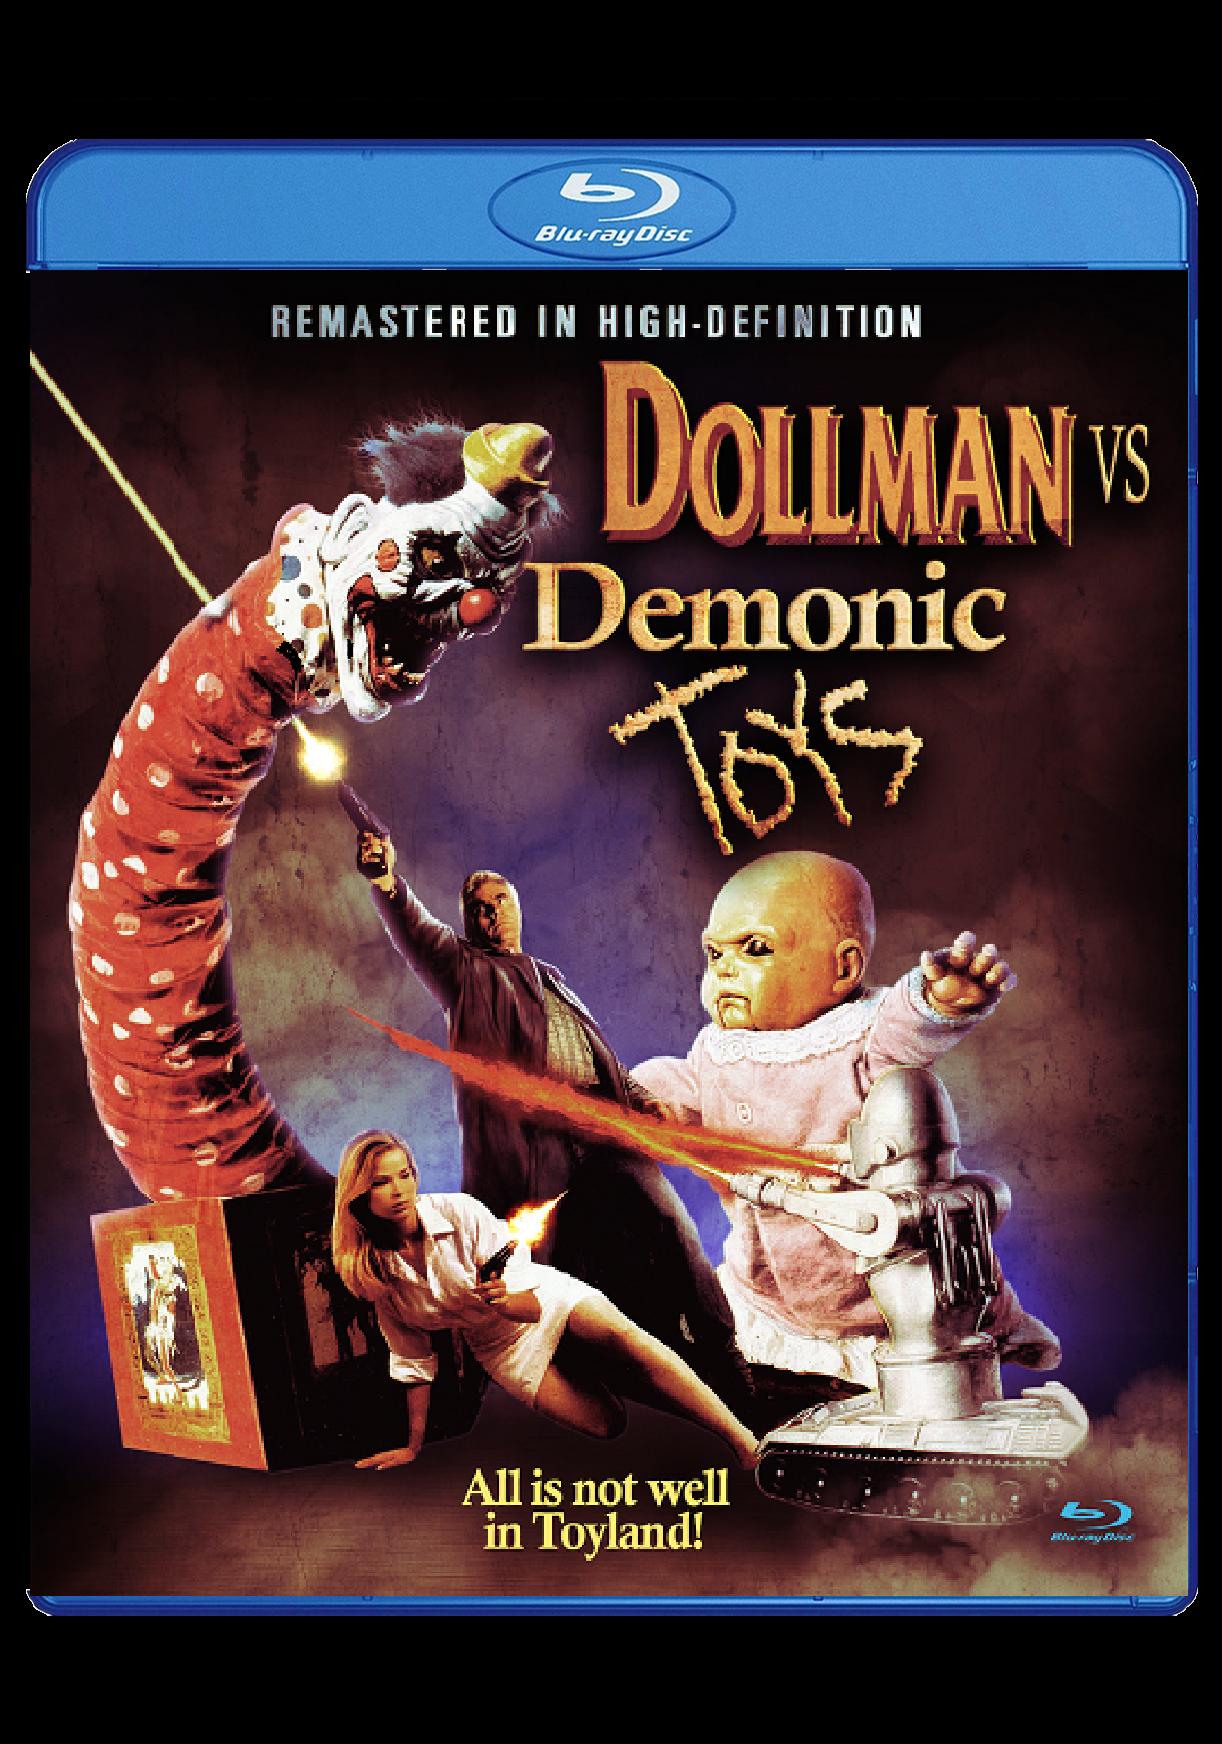 Dollman vs. Demonic Toys   Blu-Ray  $19.95